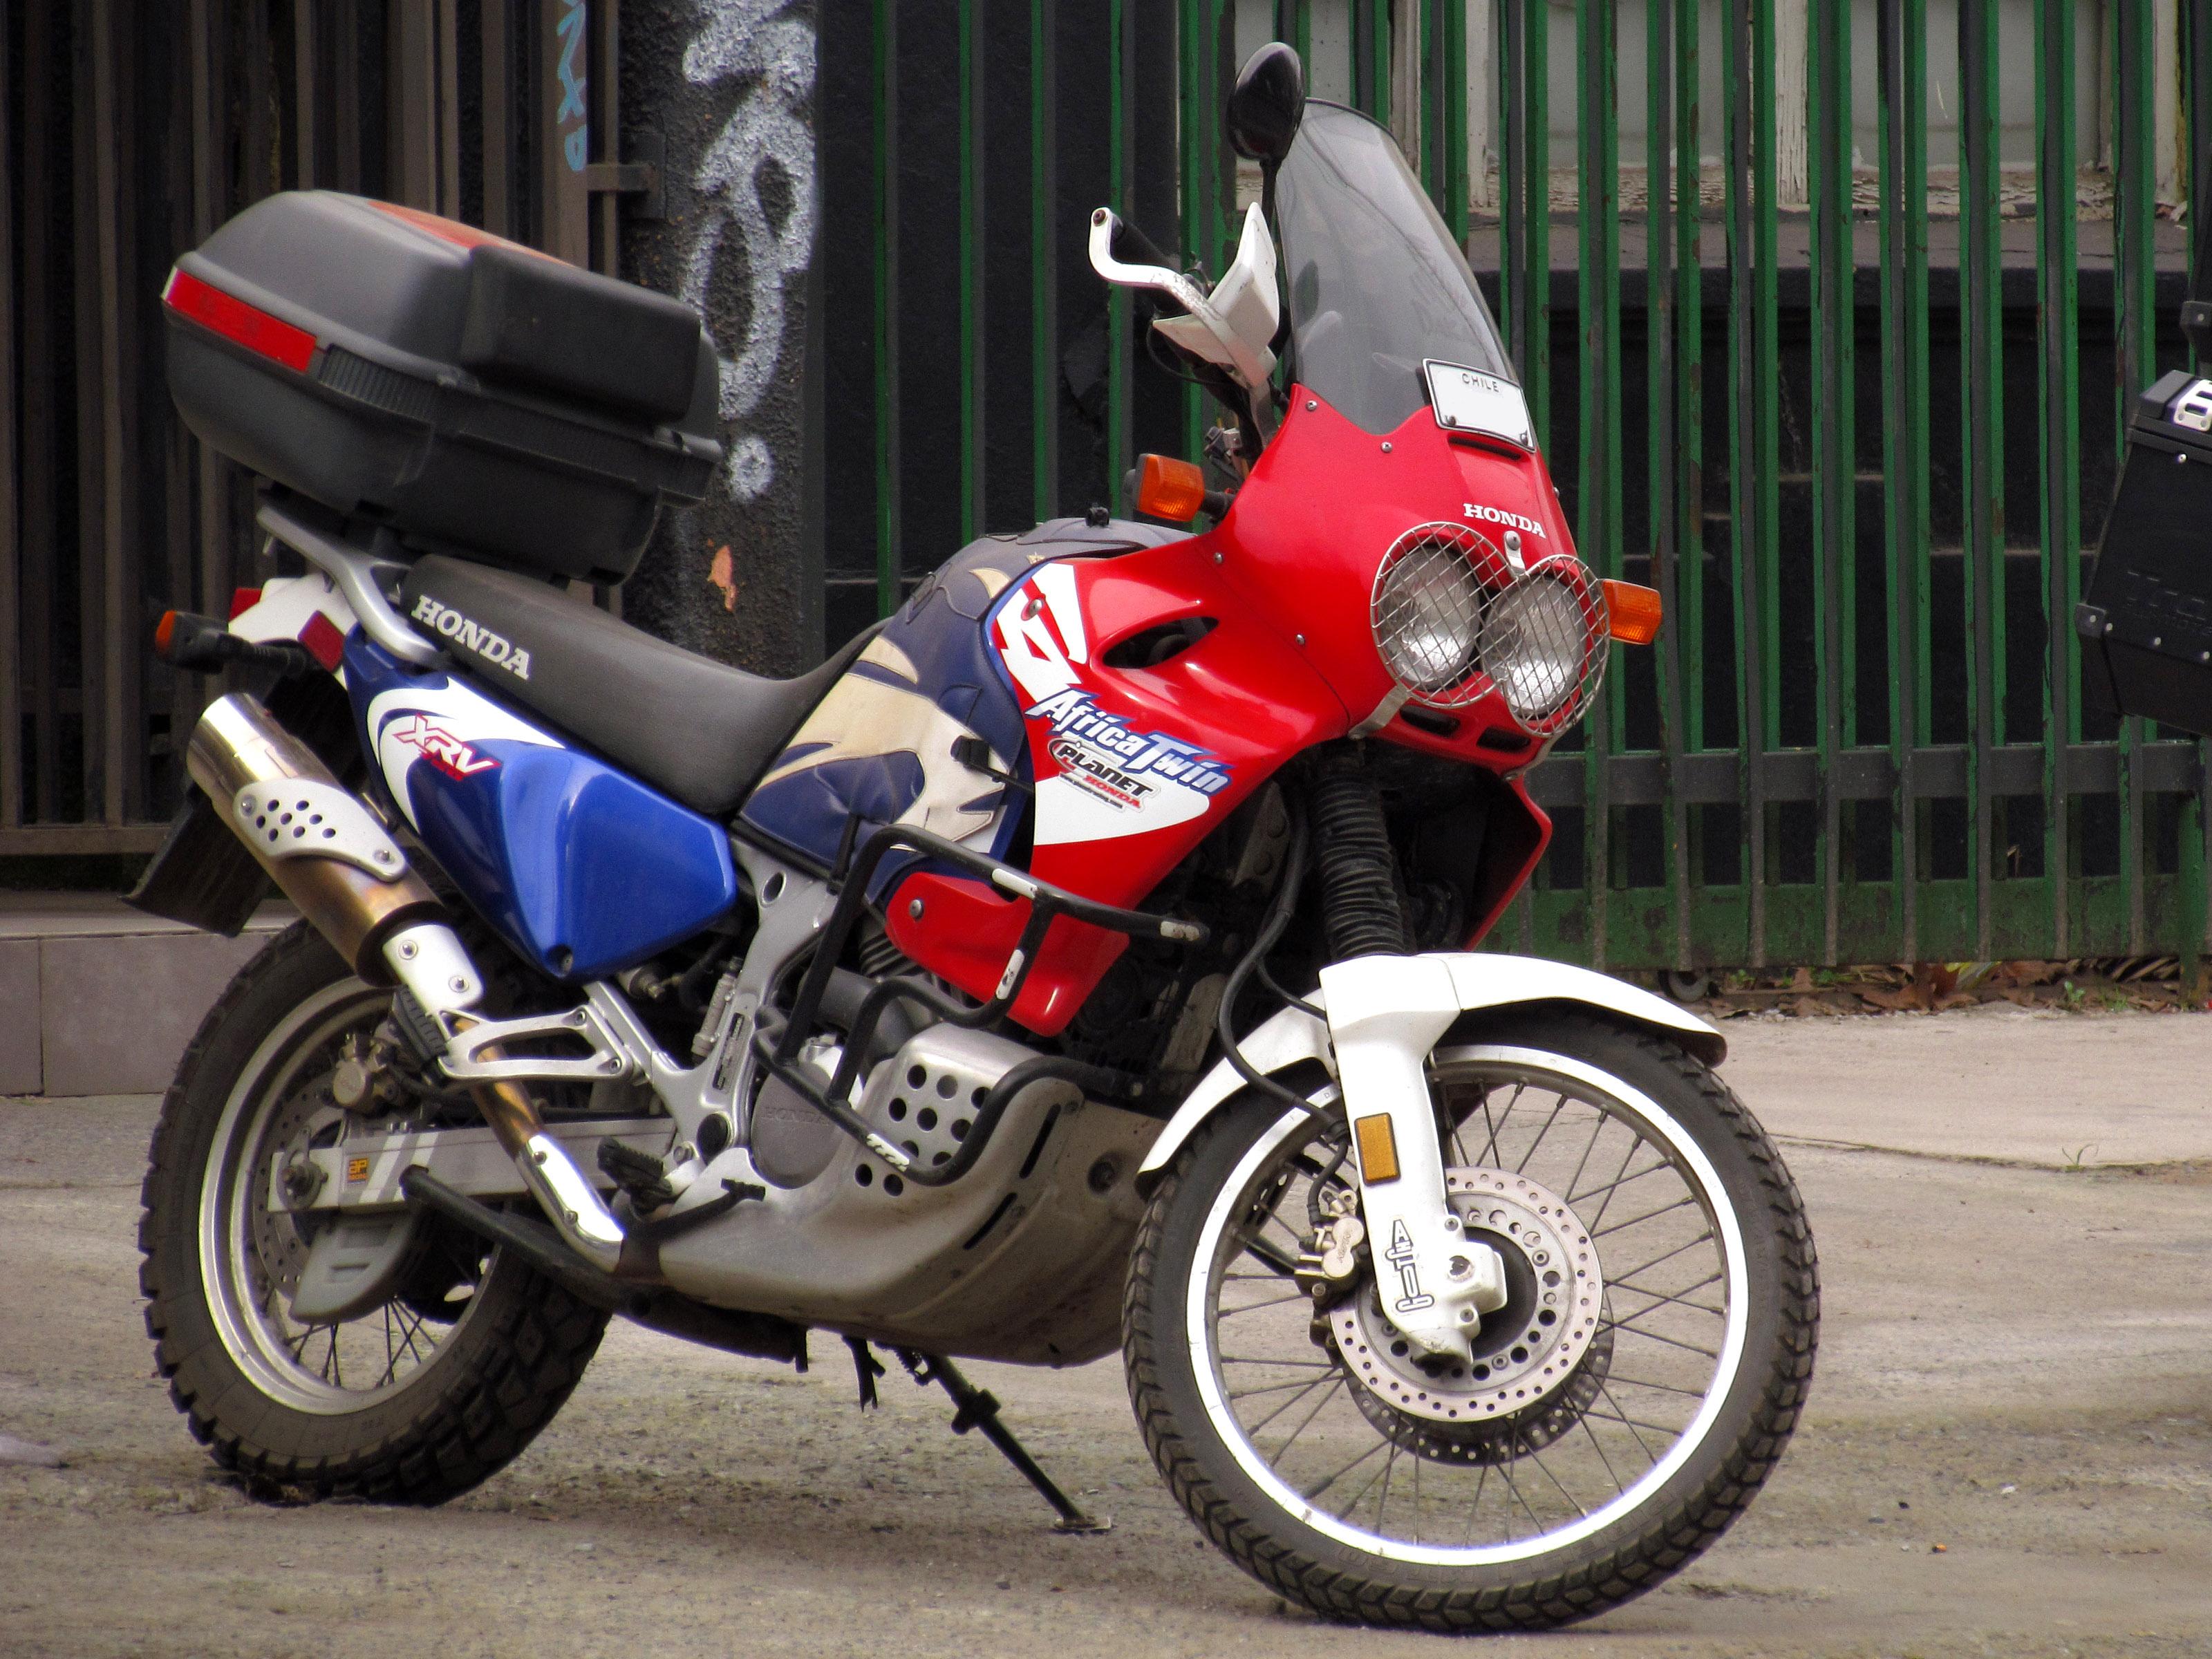 Honda XRV 750 Africa Twin RD07   Kaufen auf Ricardo